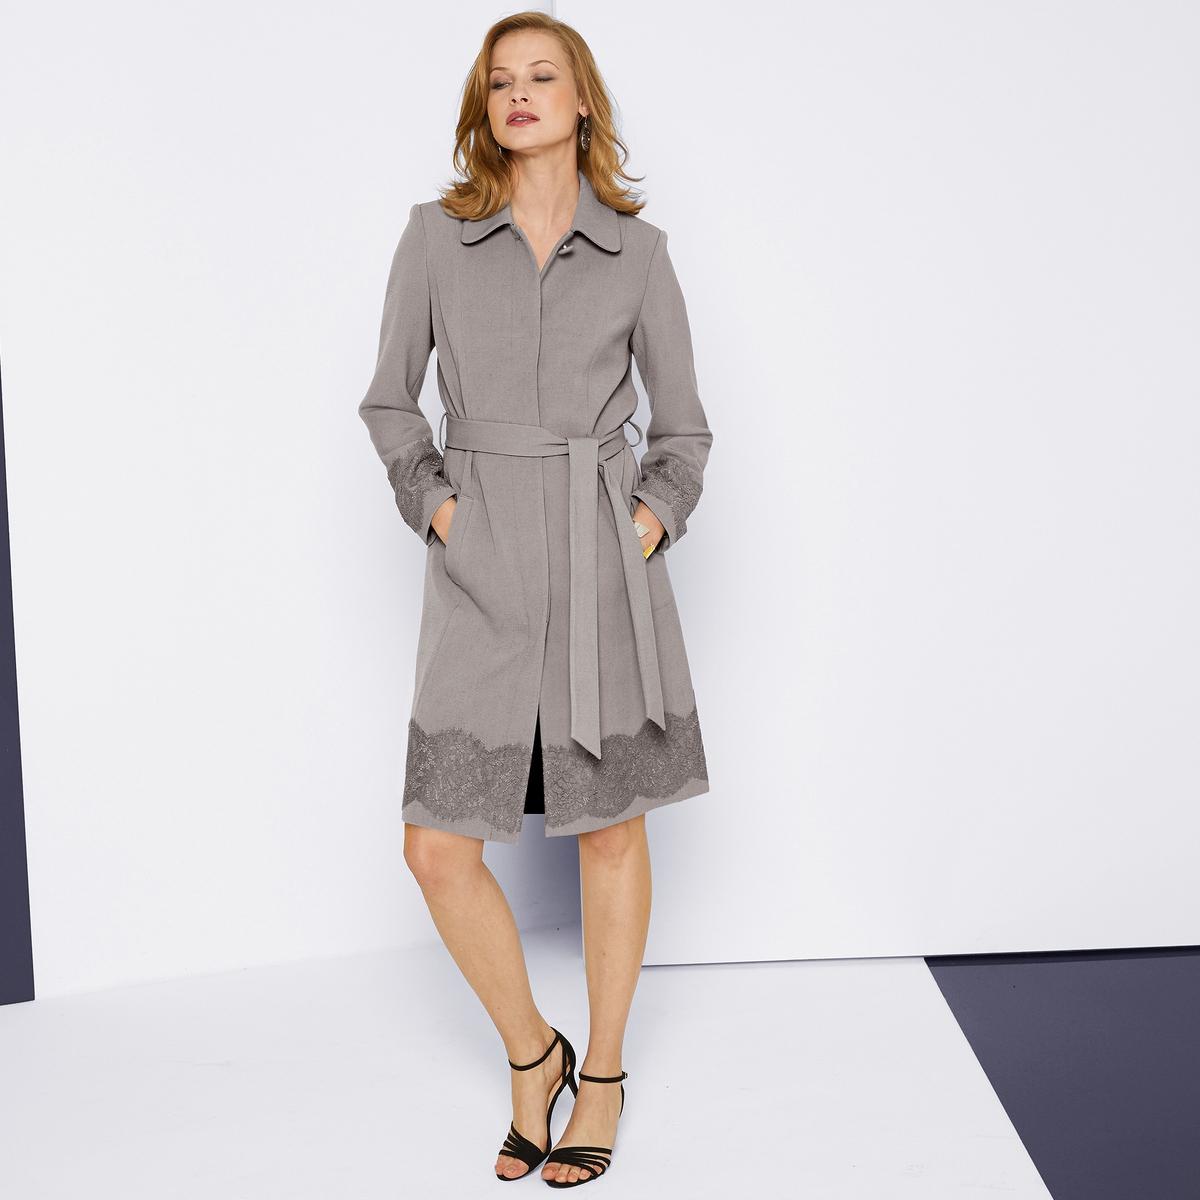 Imagen secundaria de producto de Falda recta de satén de algodón stretch - Anne weyburn